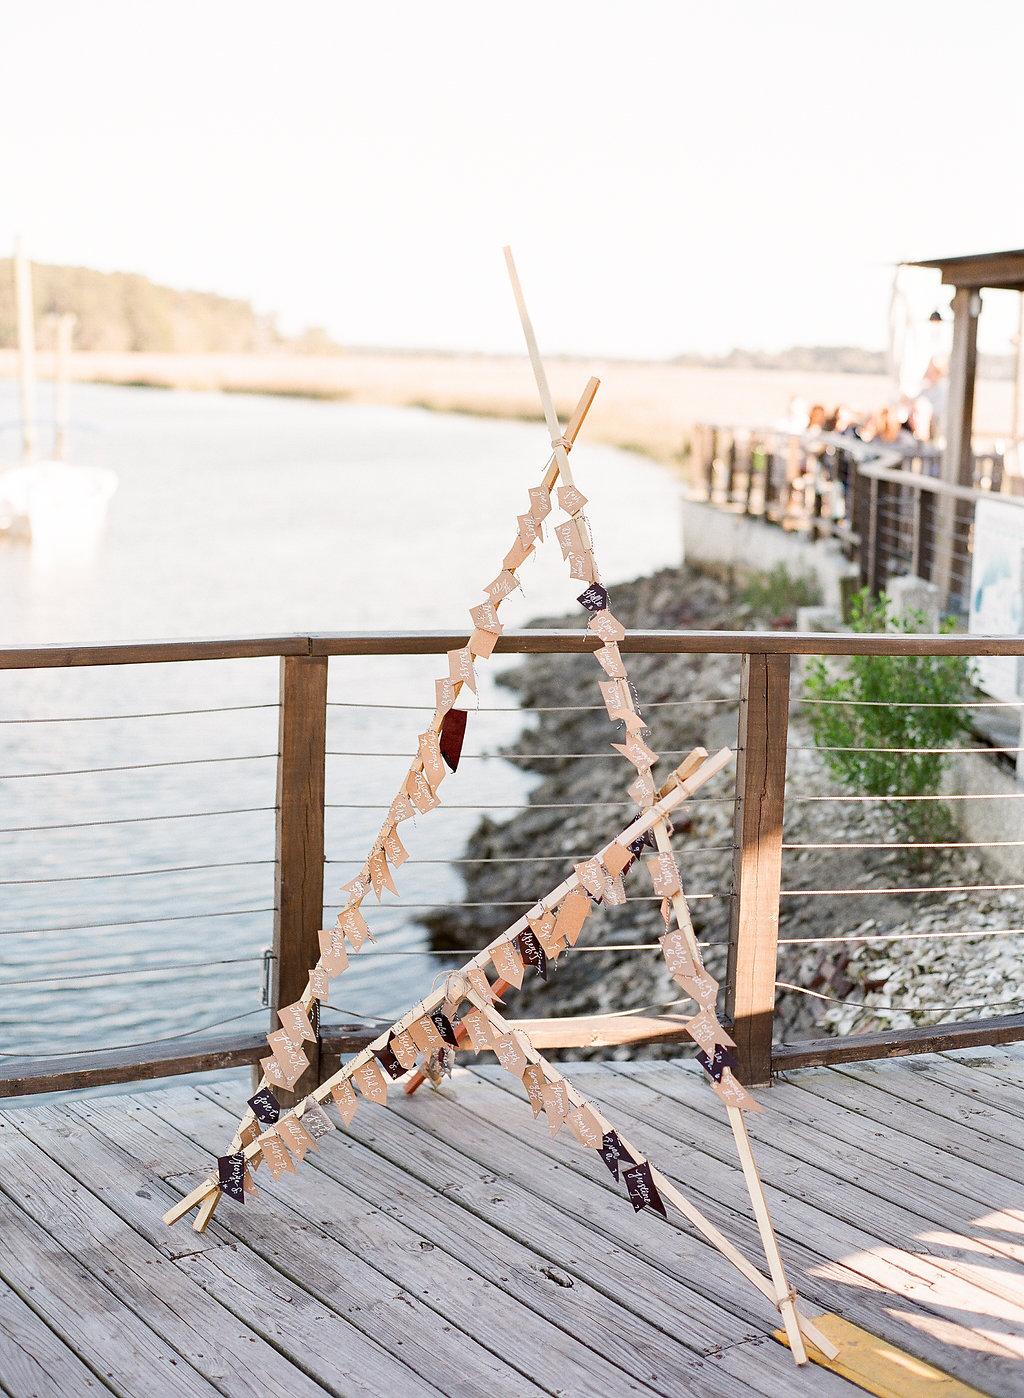 the-wyld-dock-bar-diy-wedding-escort-cards-savannah-wedding-planner-savannah-event-designer-ivory-and-beau-leather-escort-cards-calligraphy-savannah-the-wyld-dock-bar-wedding.jpg